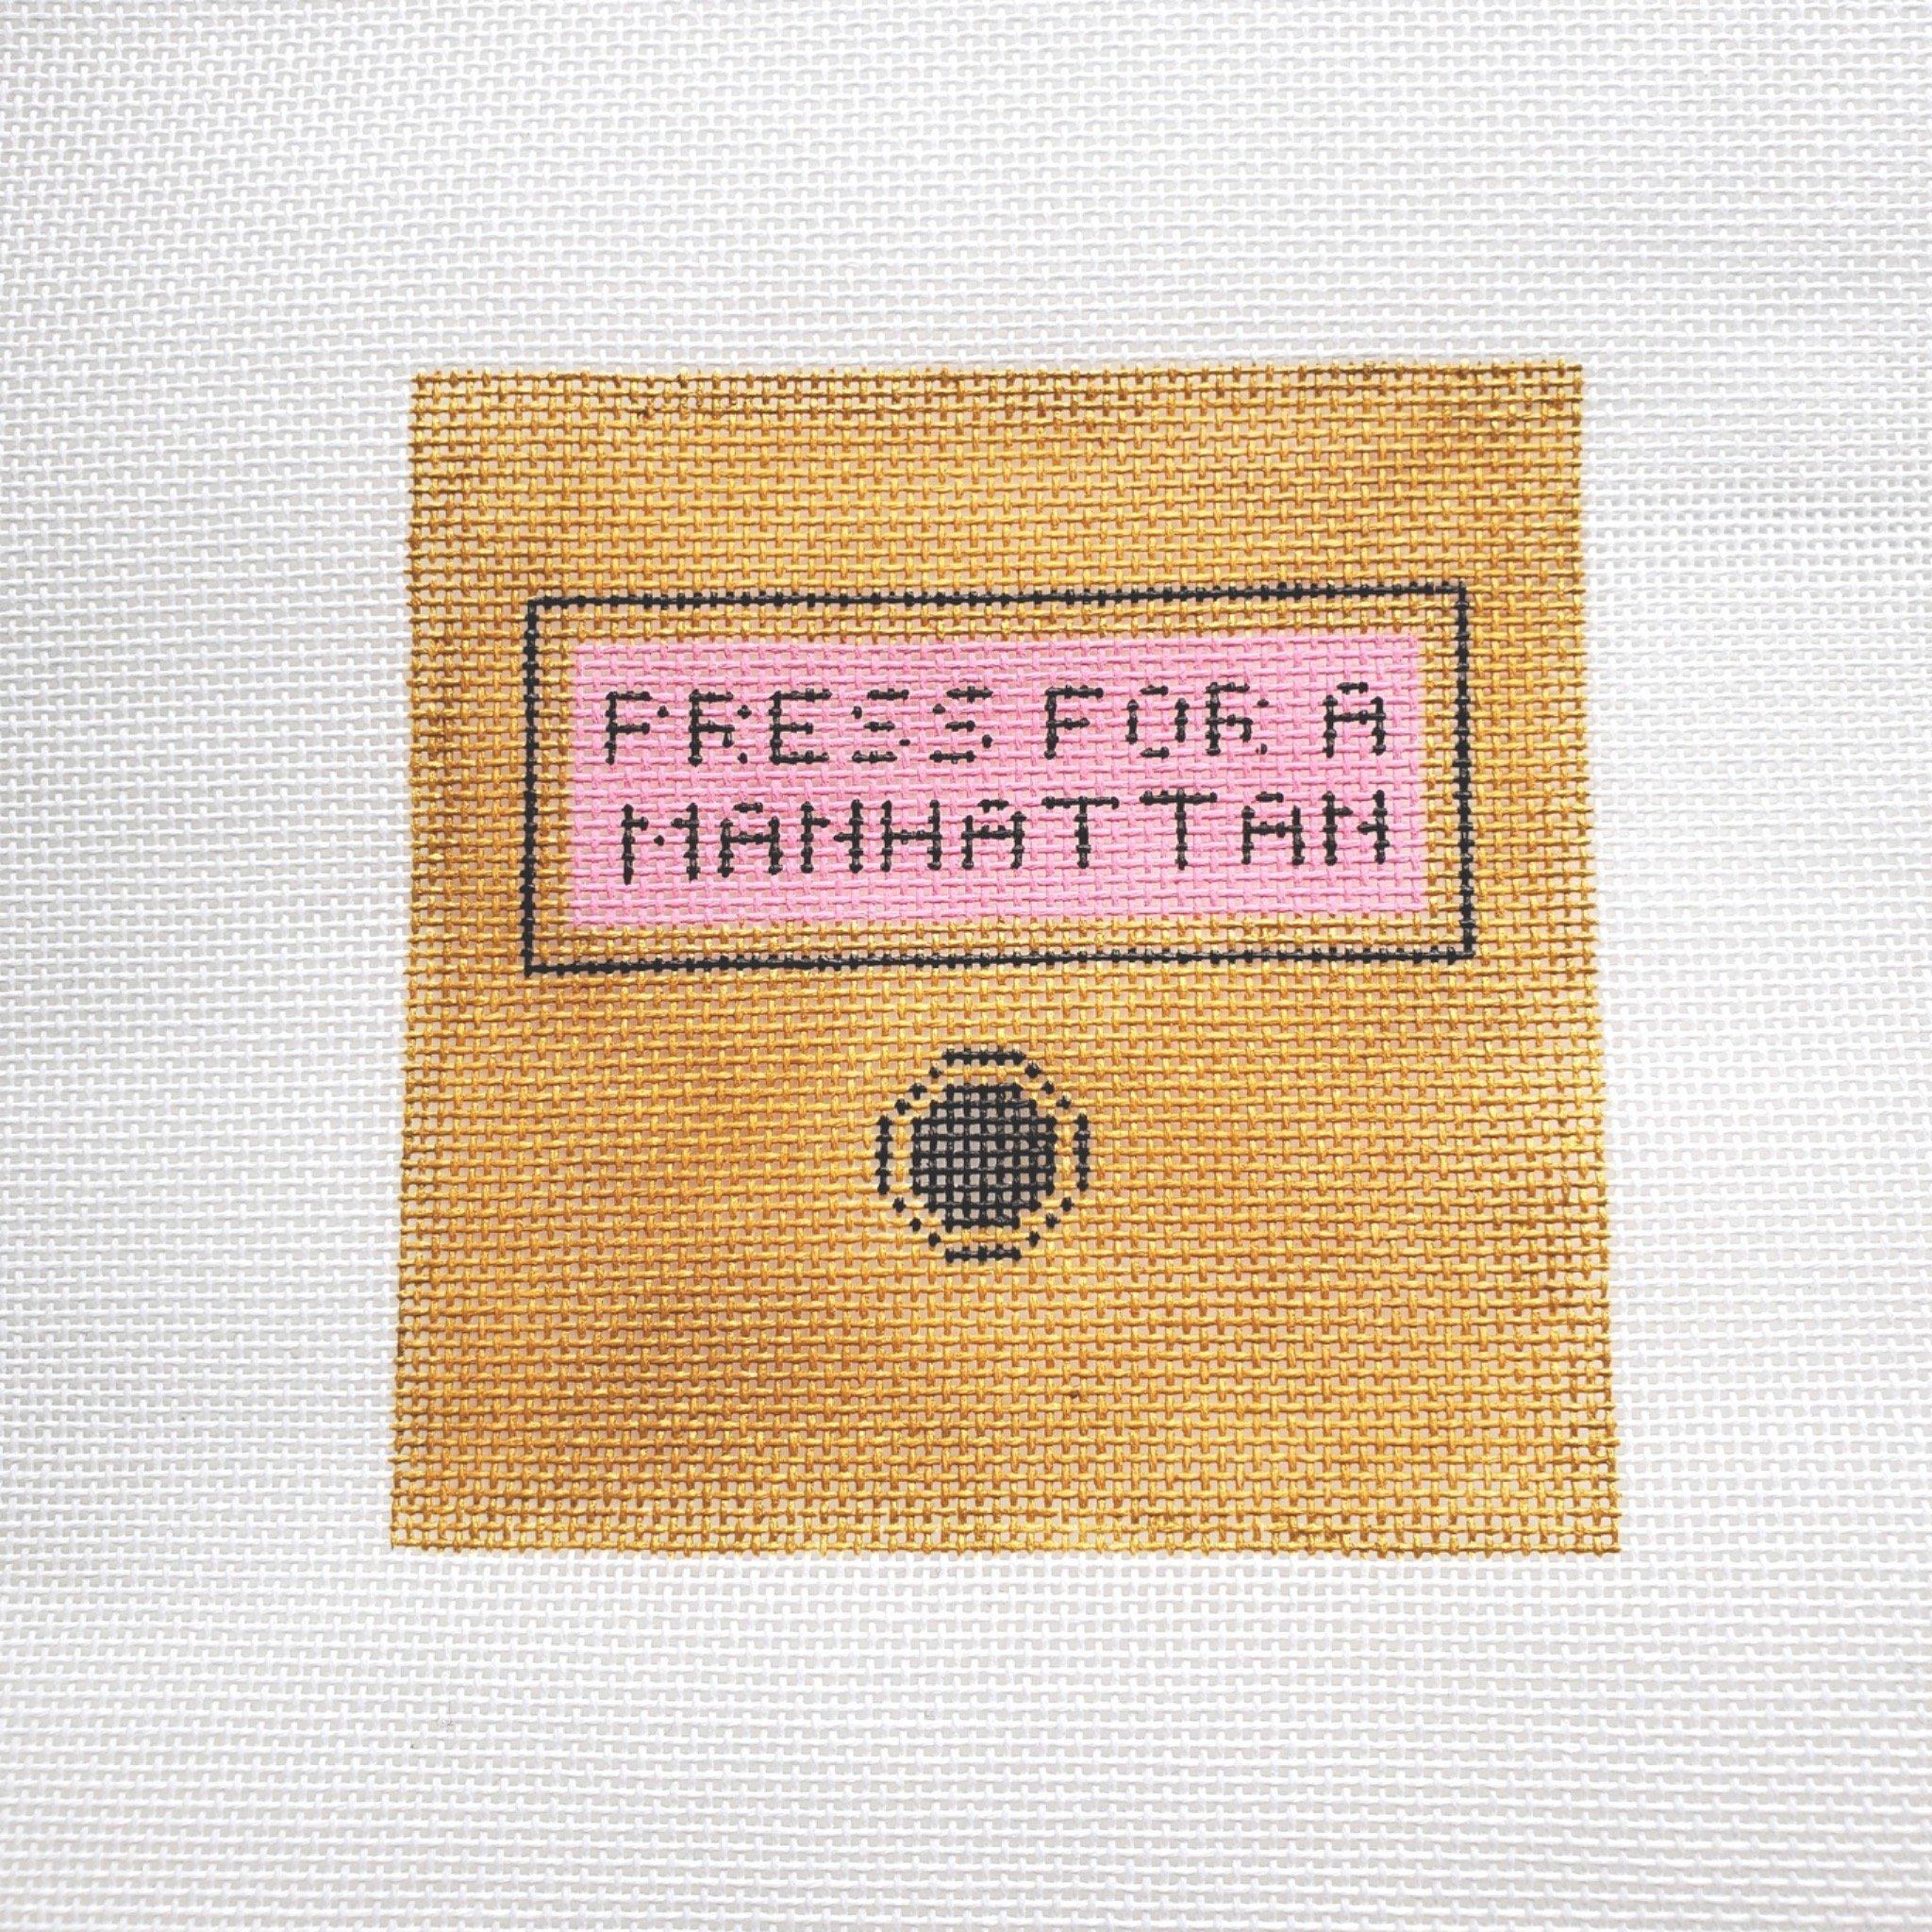 Press for a Manhattan